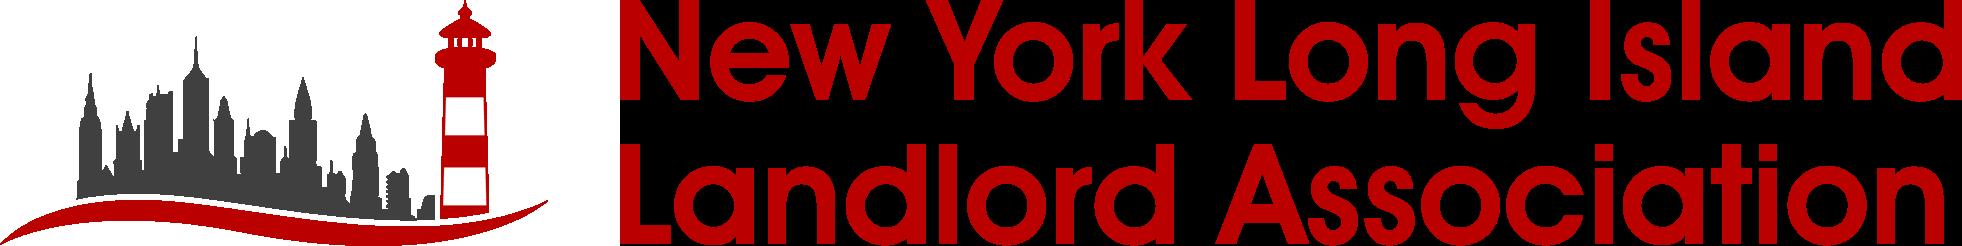 New York Long Island Landlord Association